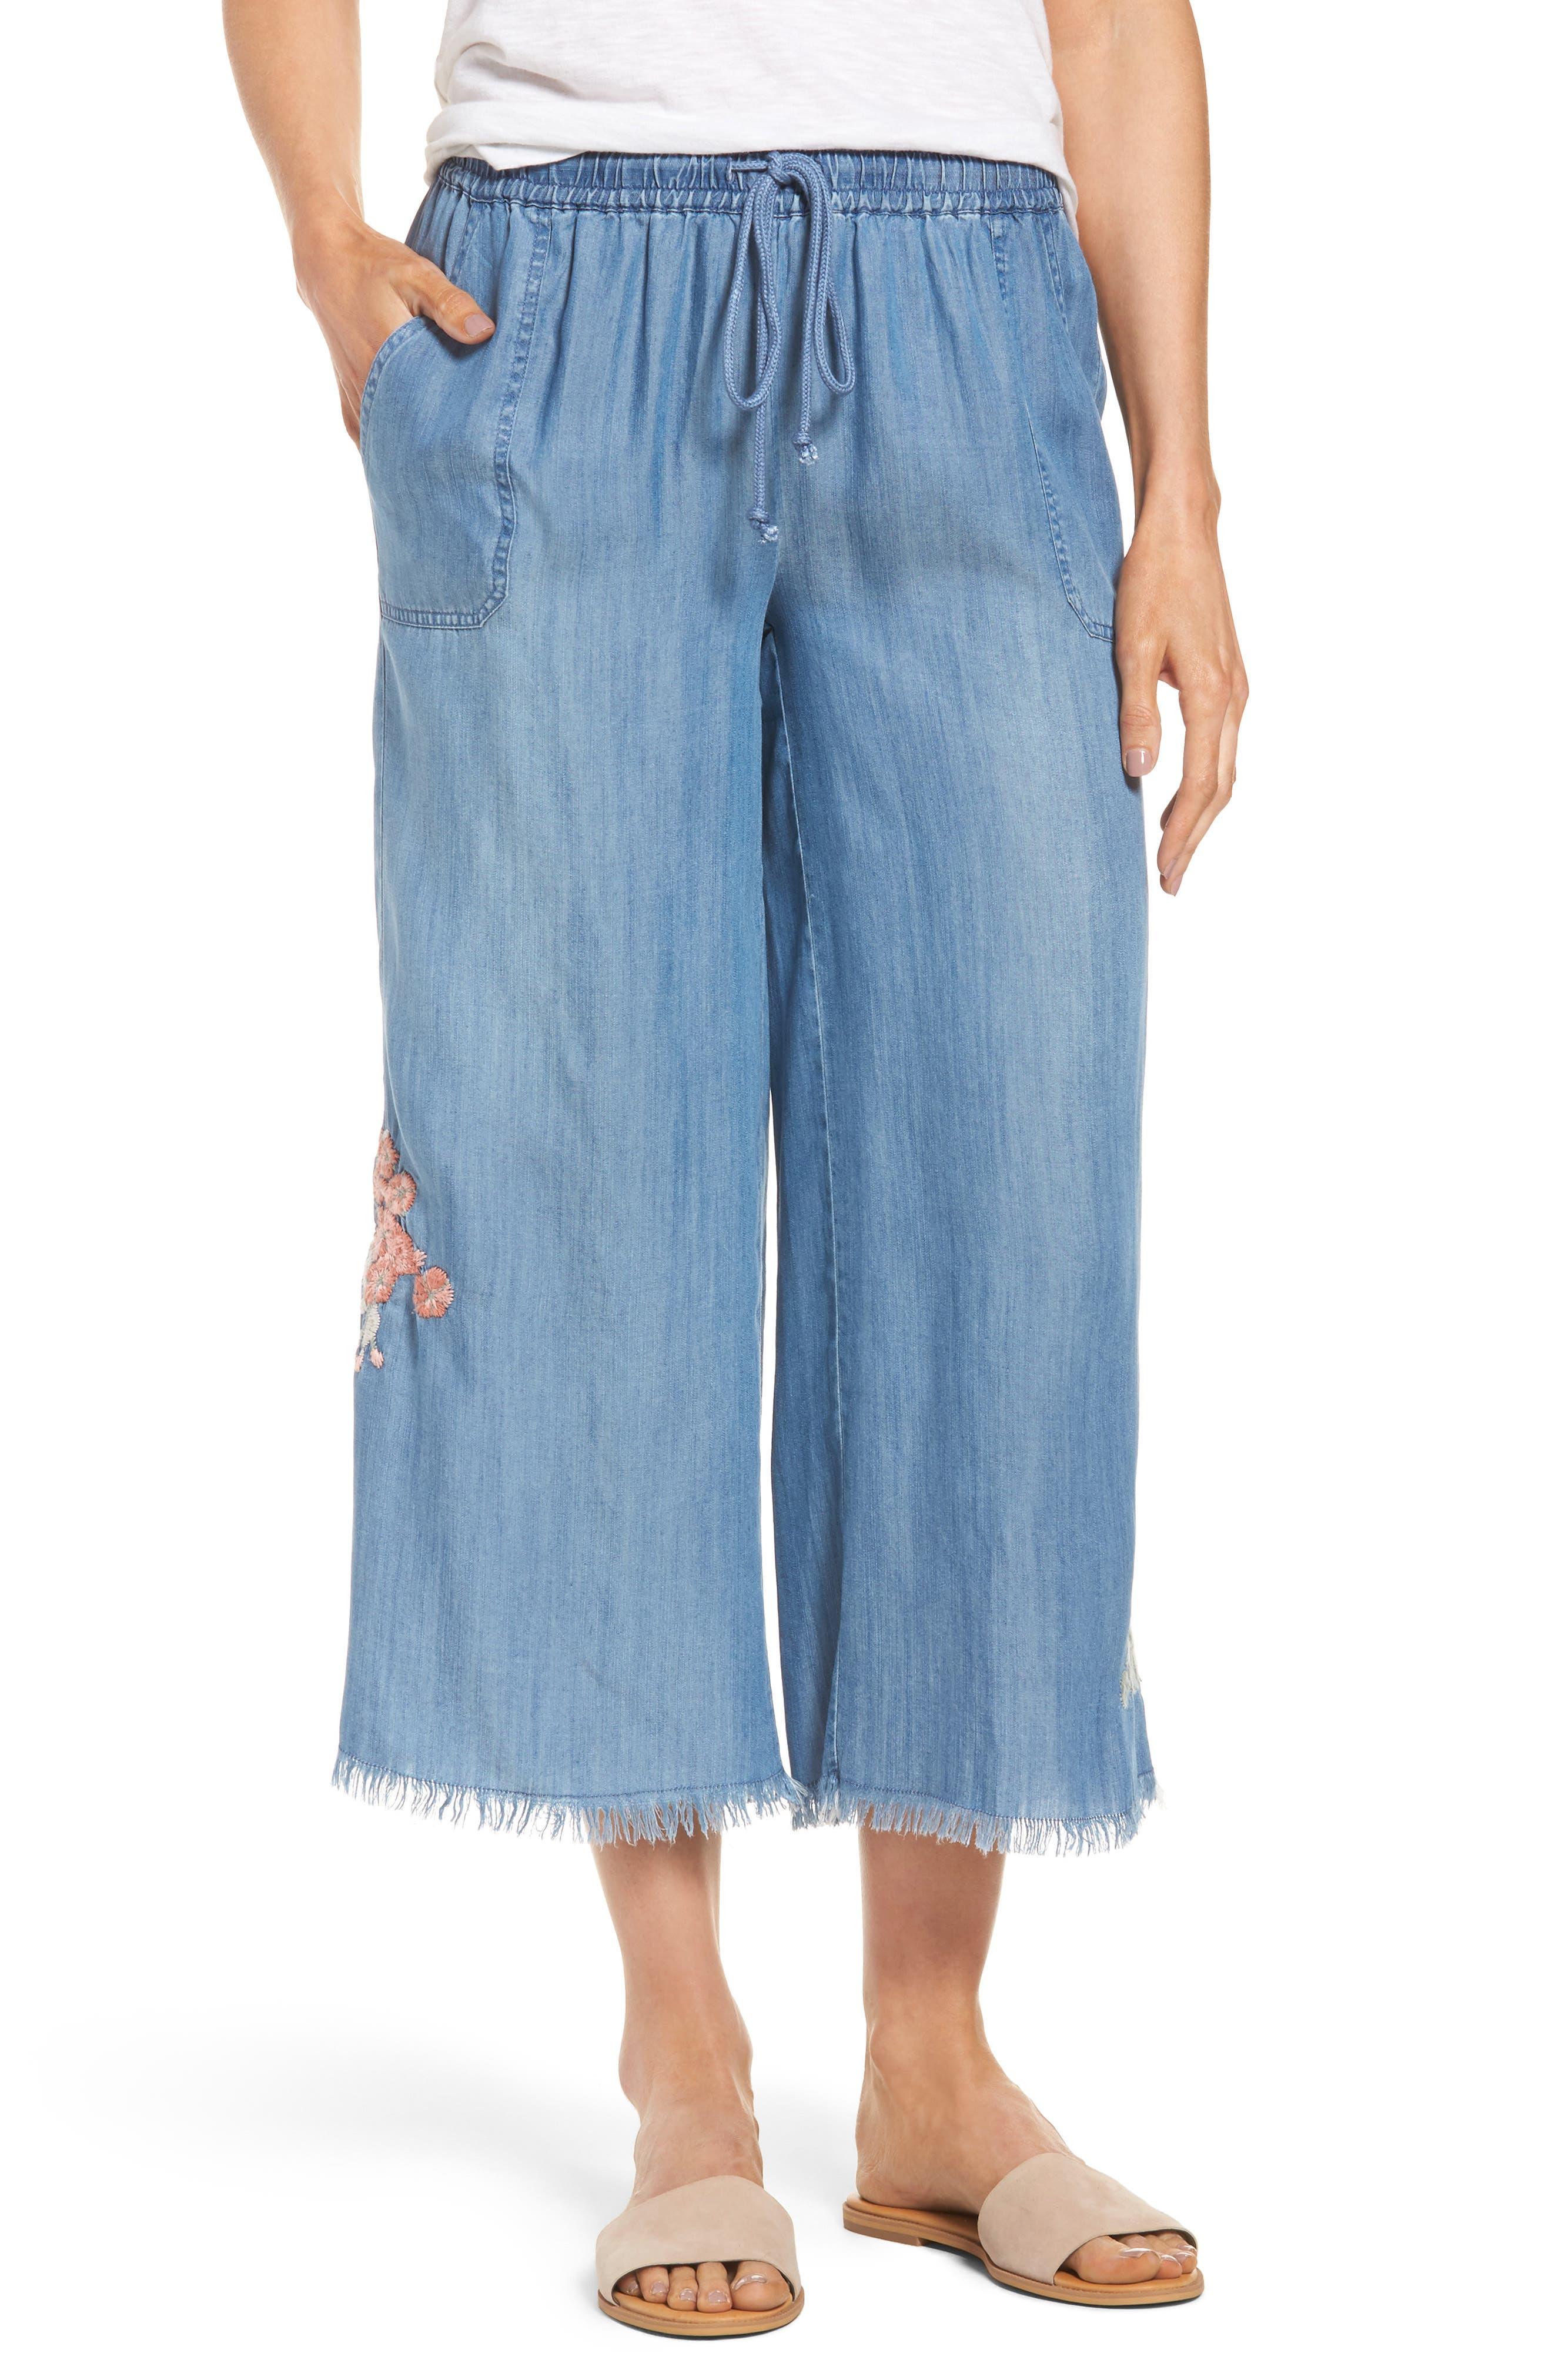 Alternate Image 1 Selected - BILLY T Embroidered Denim Wide Leg Crop Pants